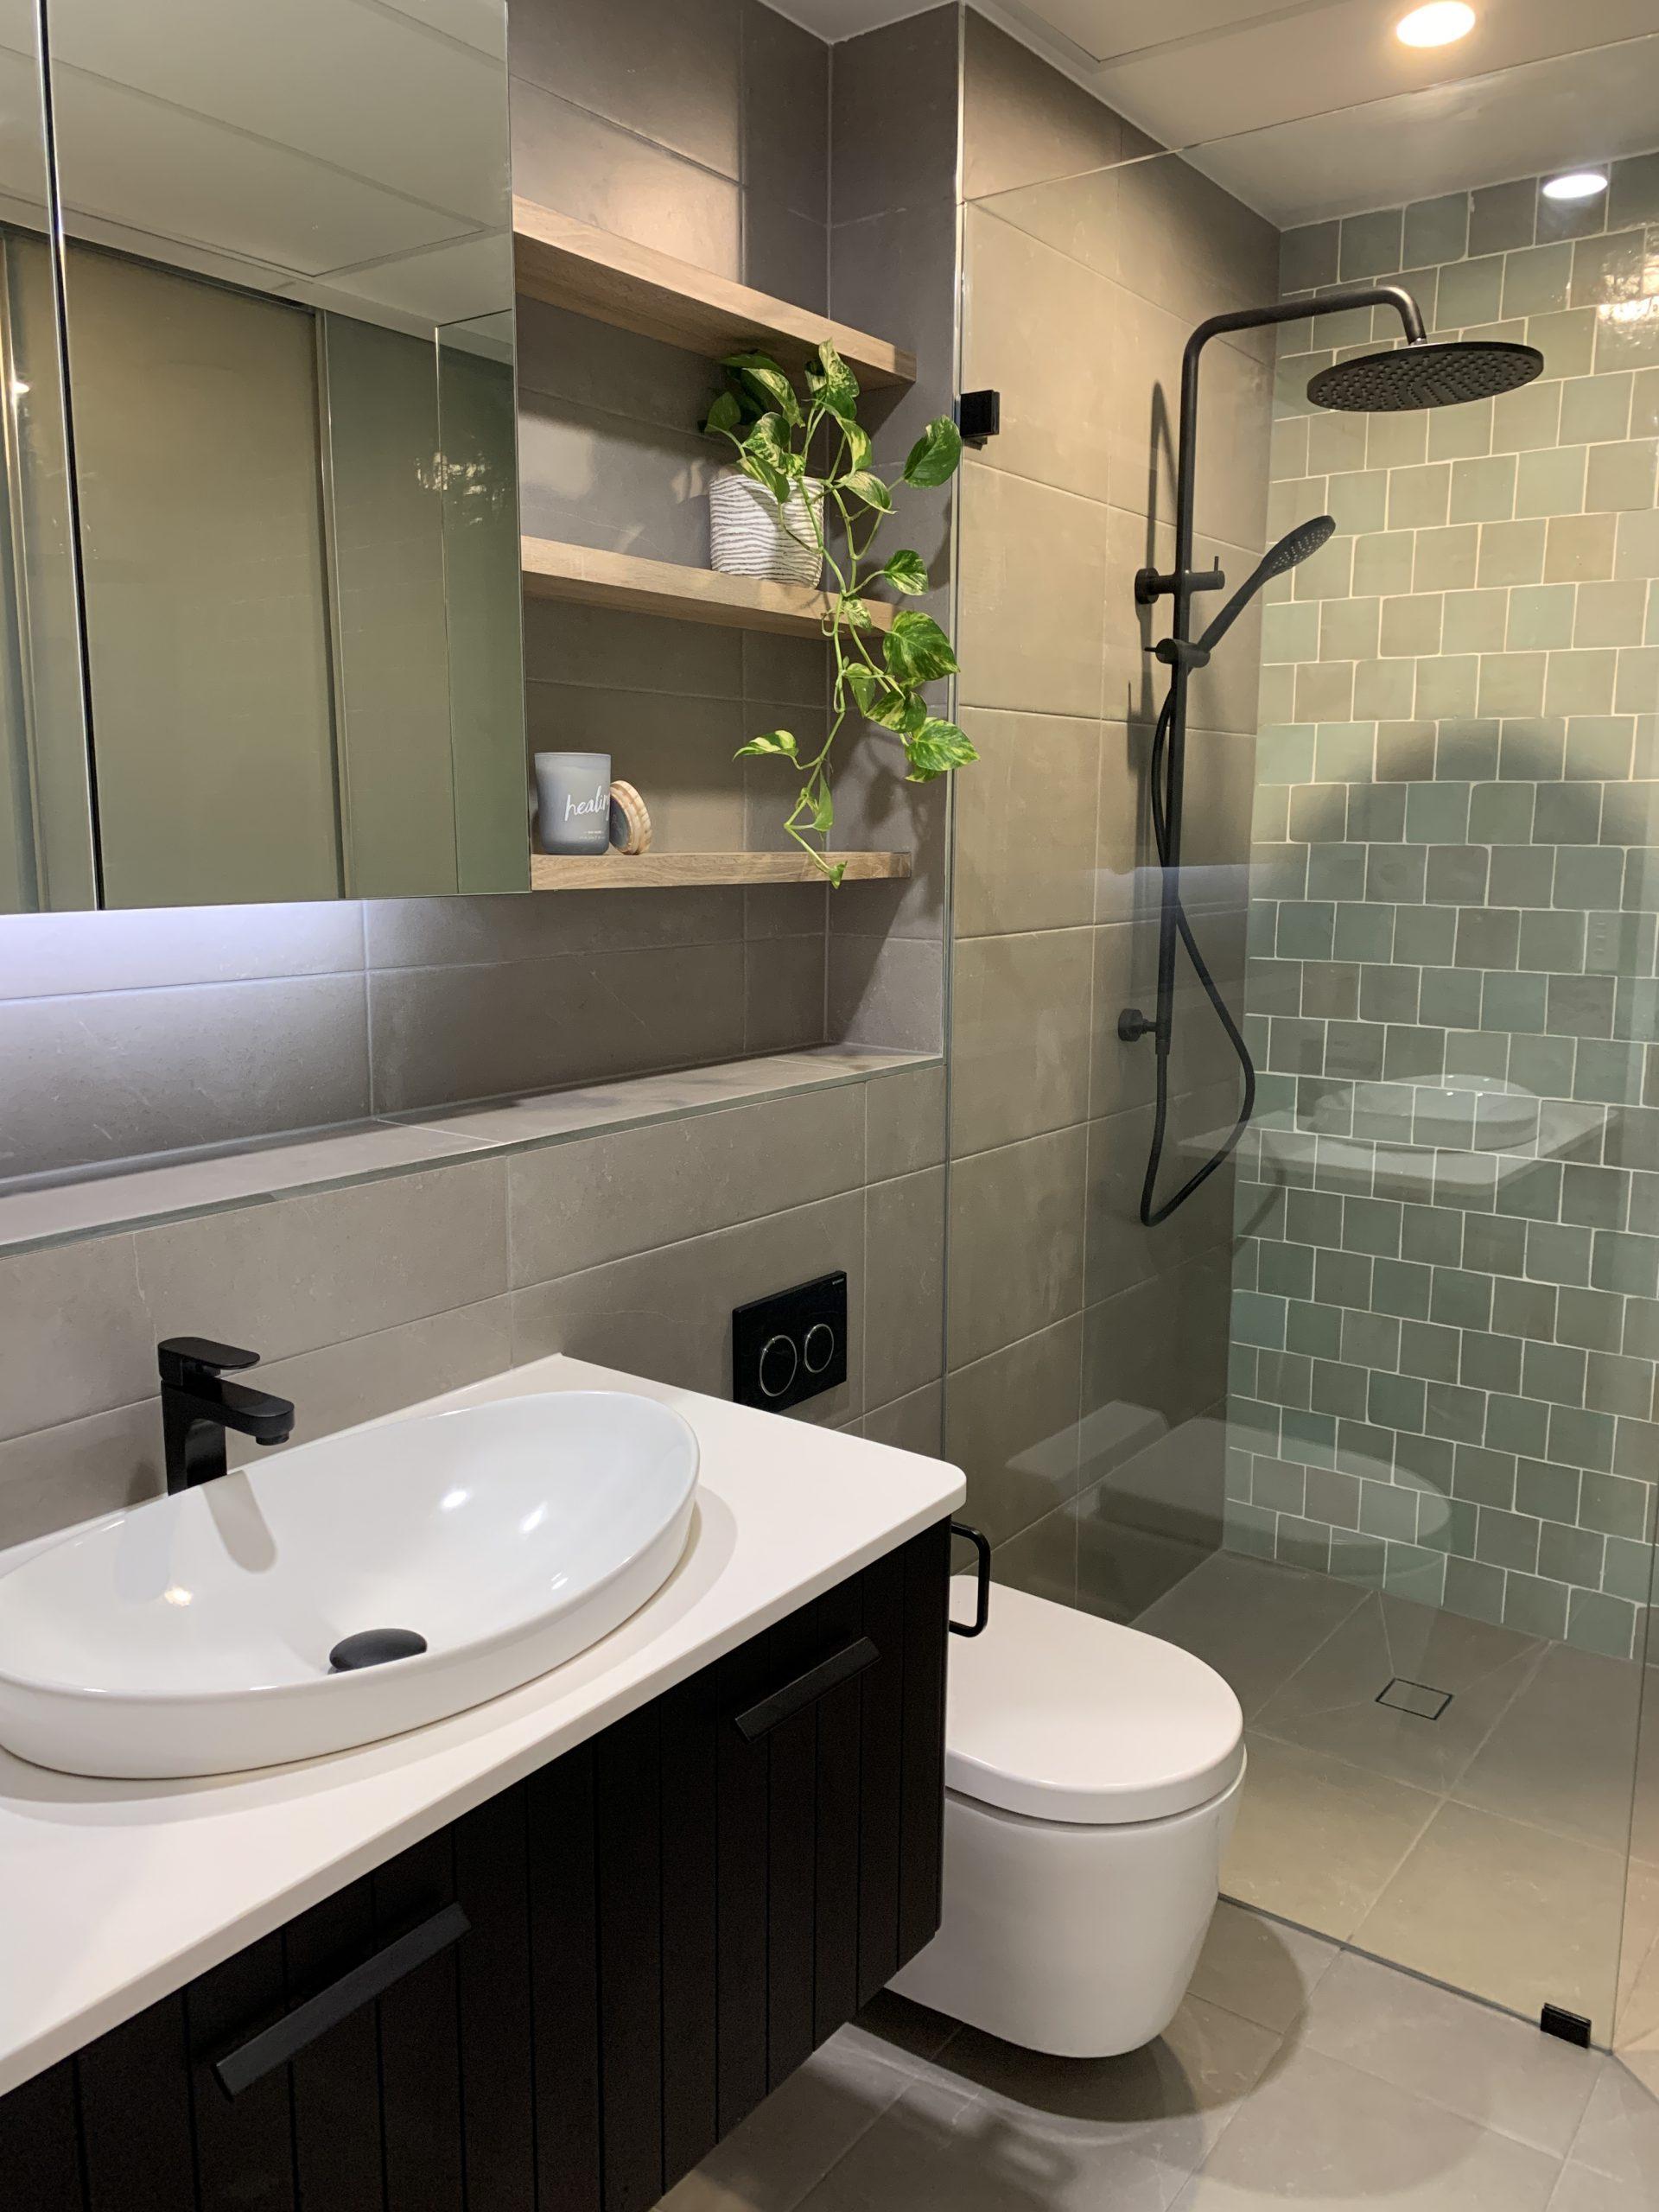 https://www.ivyandfinch.com.au/wp-content/uploads/2021/02/Interior-Design-Teneriffe-Bathroom-Renovation-scaled.jpg